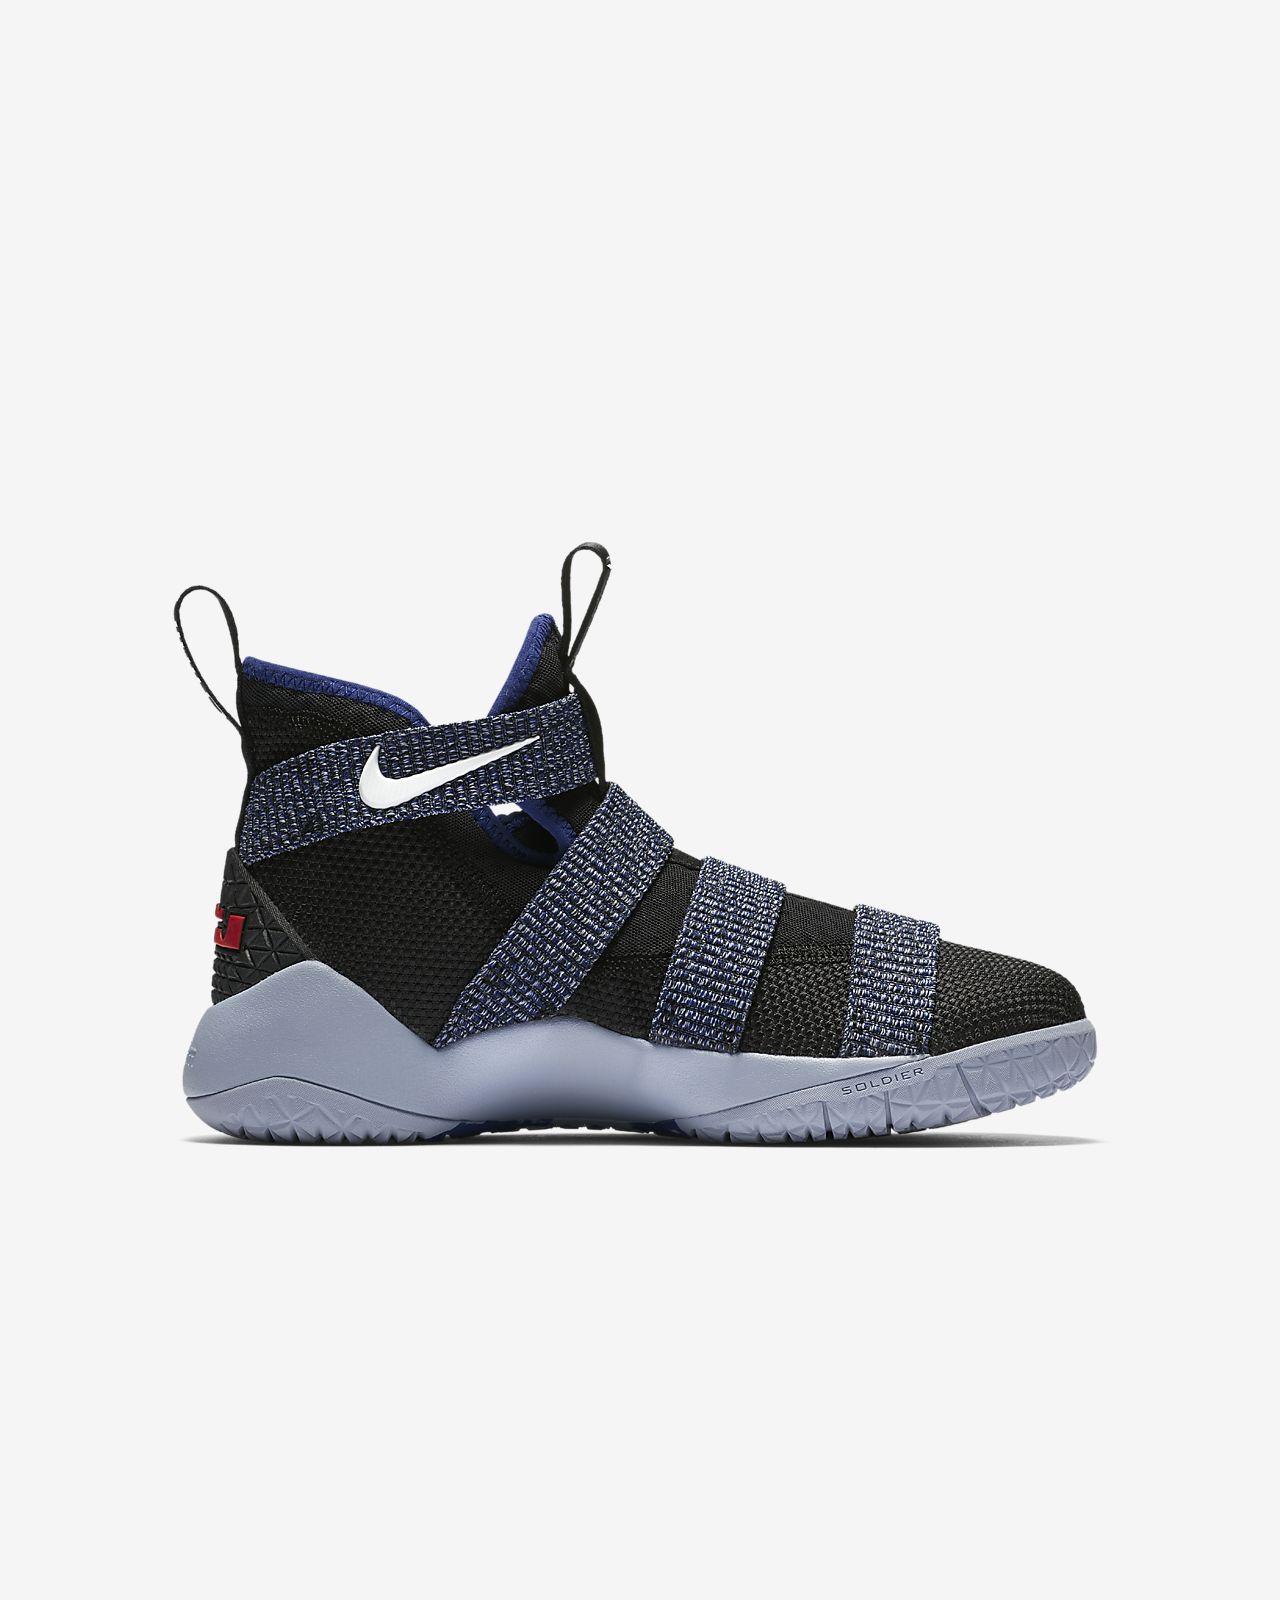 Nike Shoes Torch Ii Black Gold Price  c29a1b6de